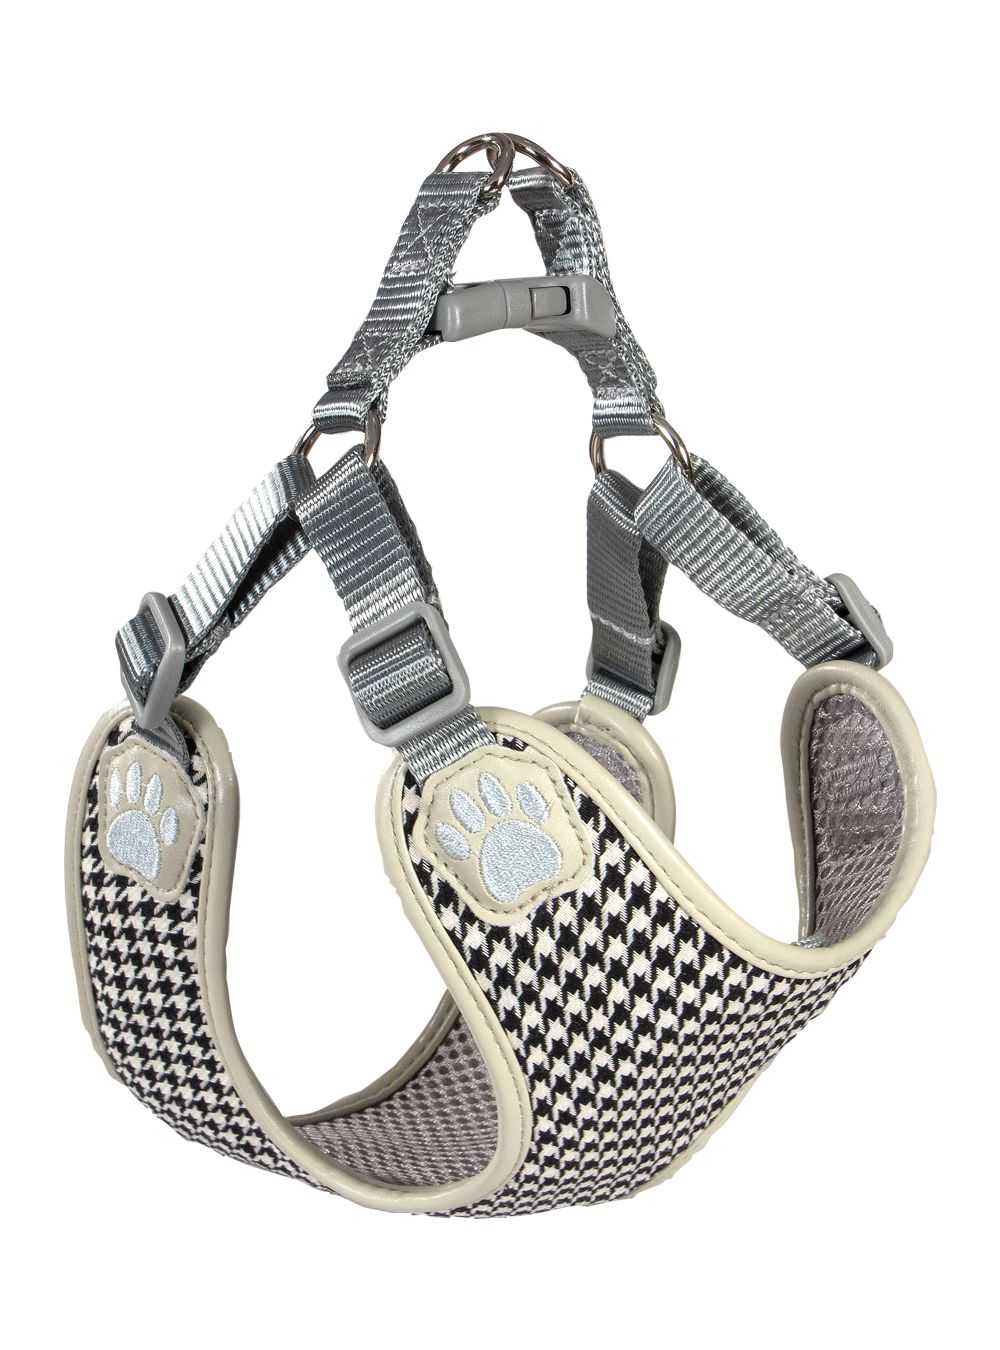 Pretty Paw London Buckingham Dog Harness